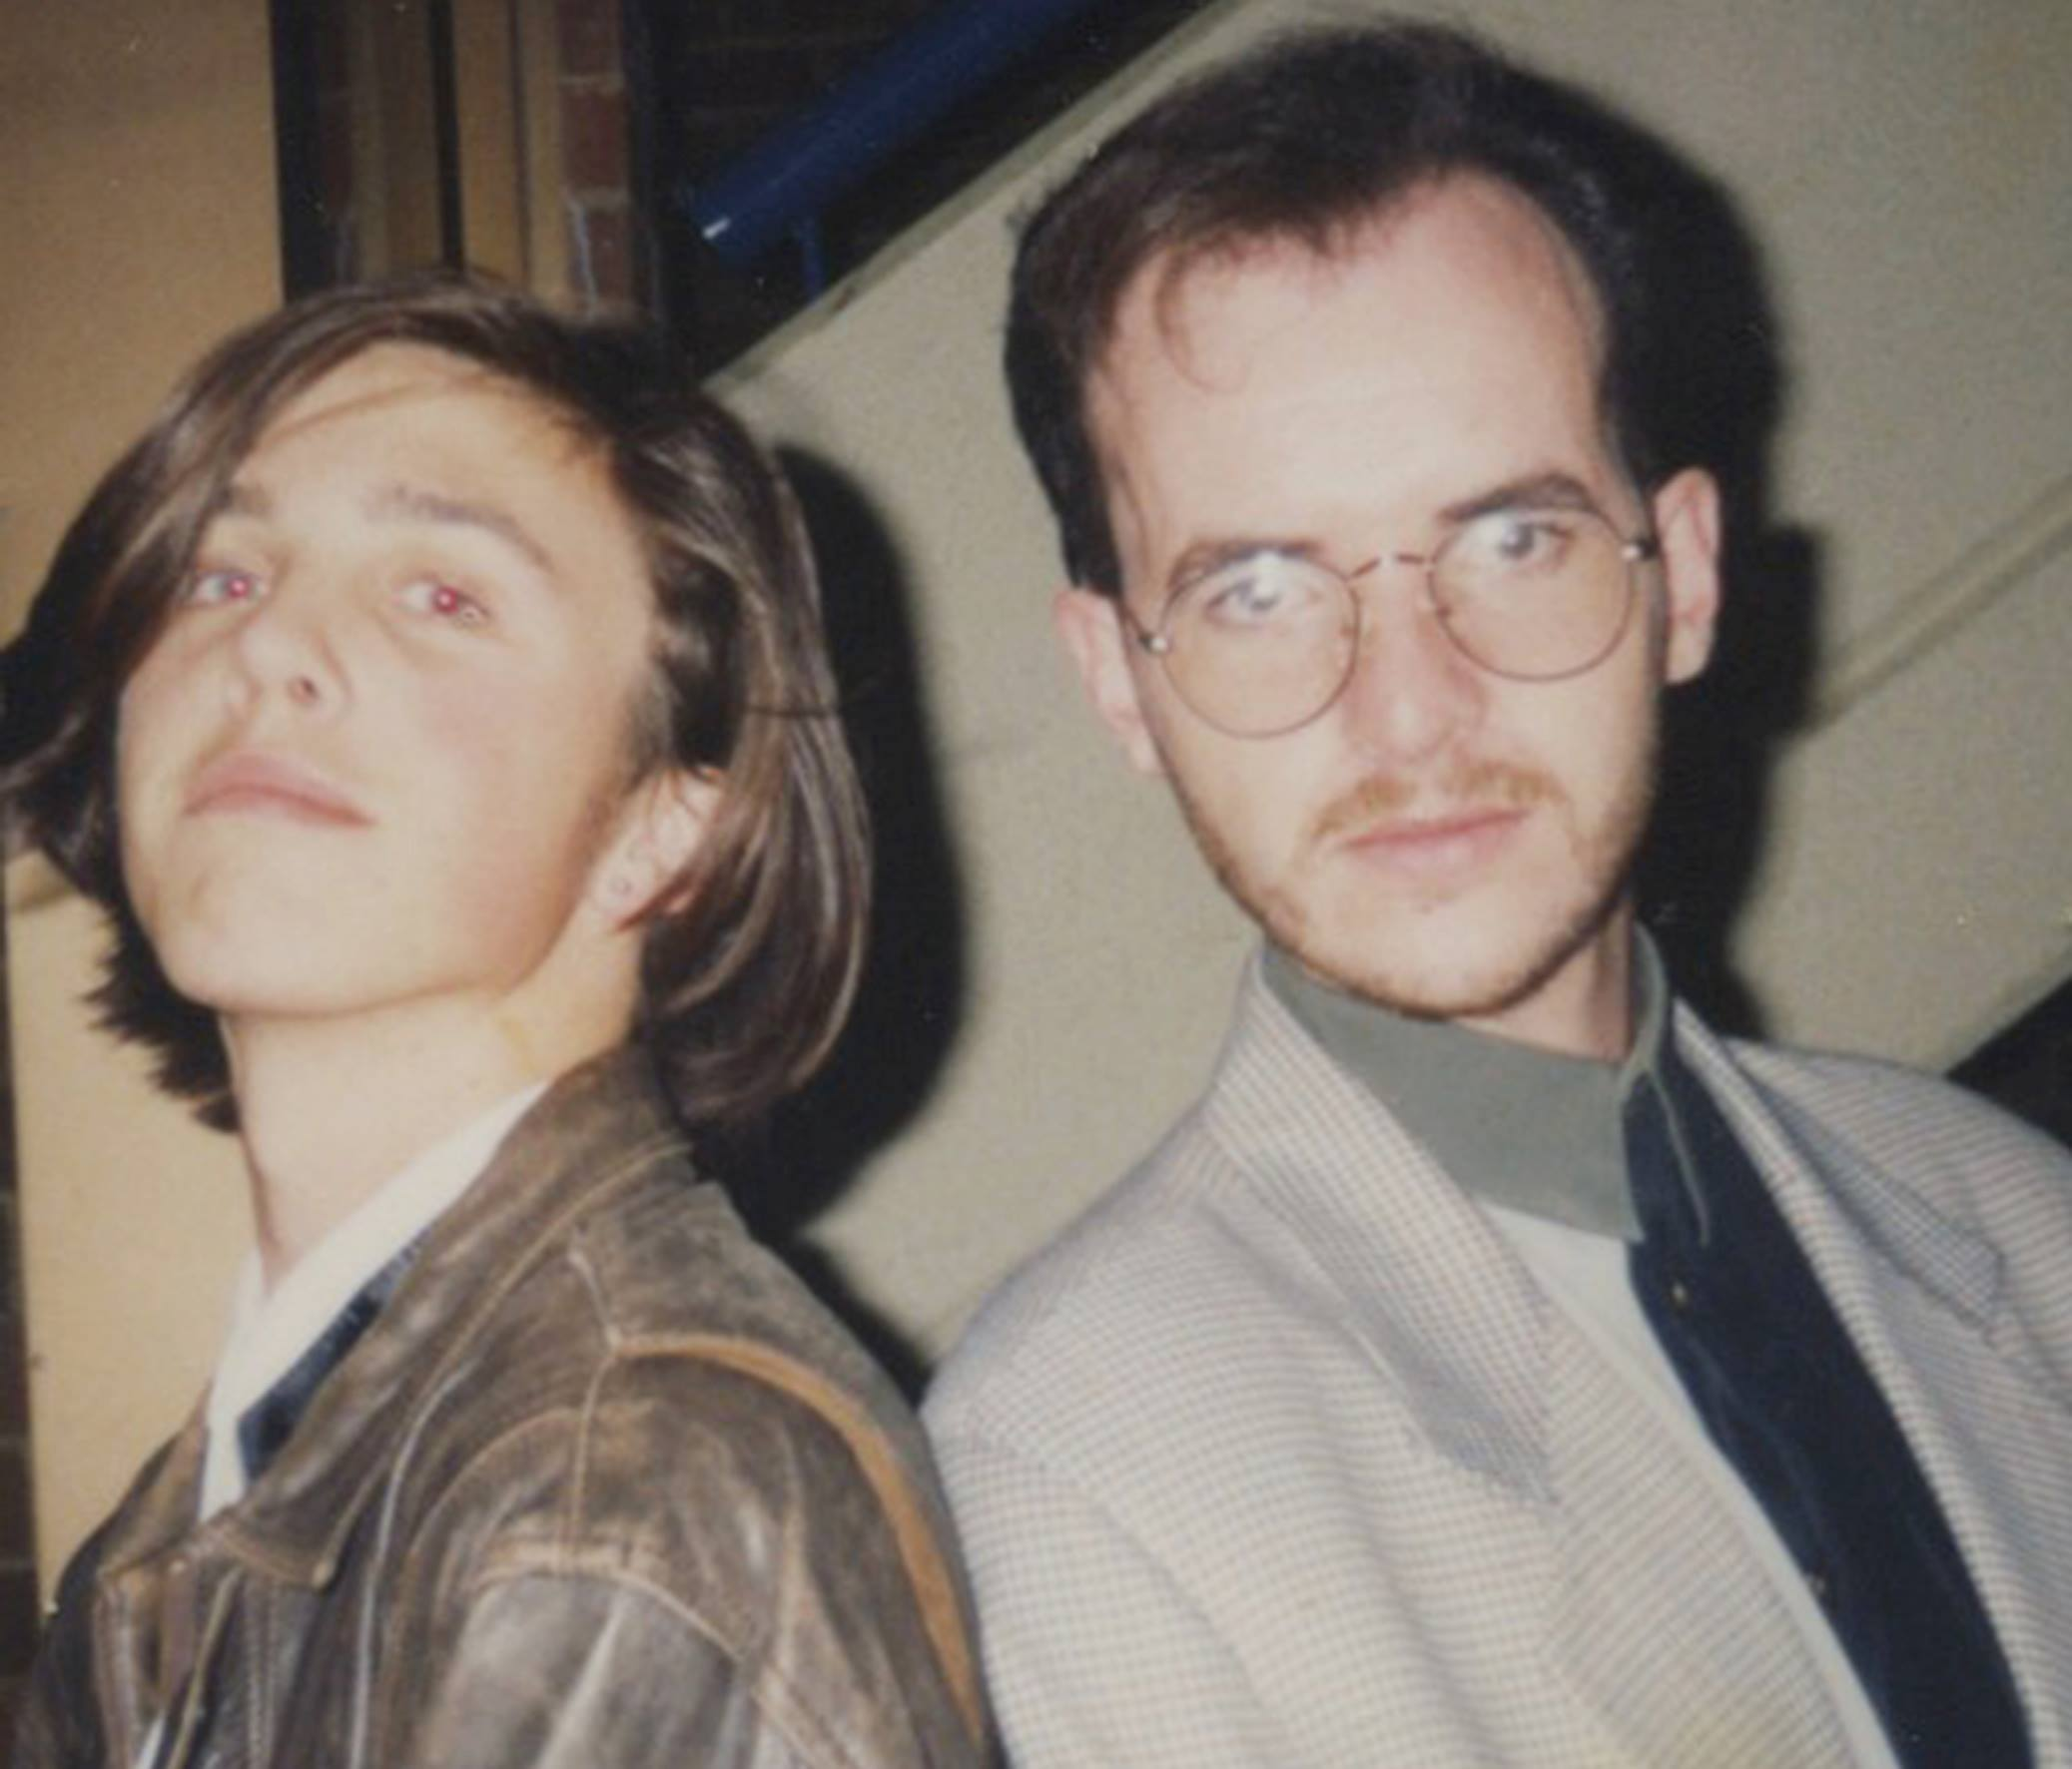 Daniel Mudie Cunningham and Iain Wallace, 1992.